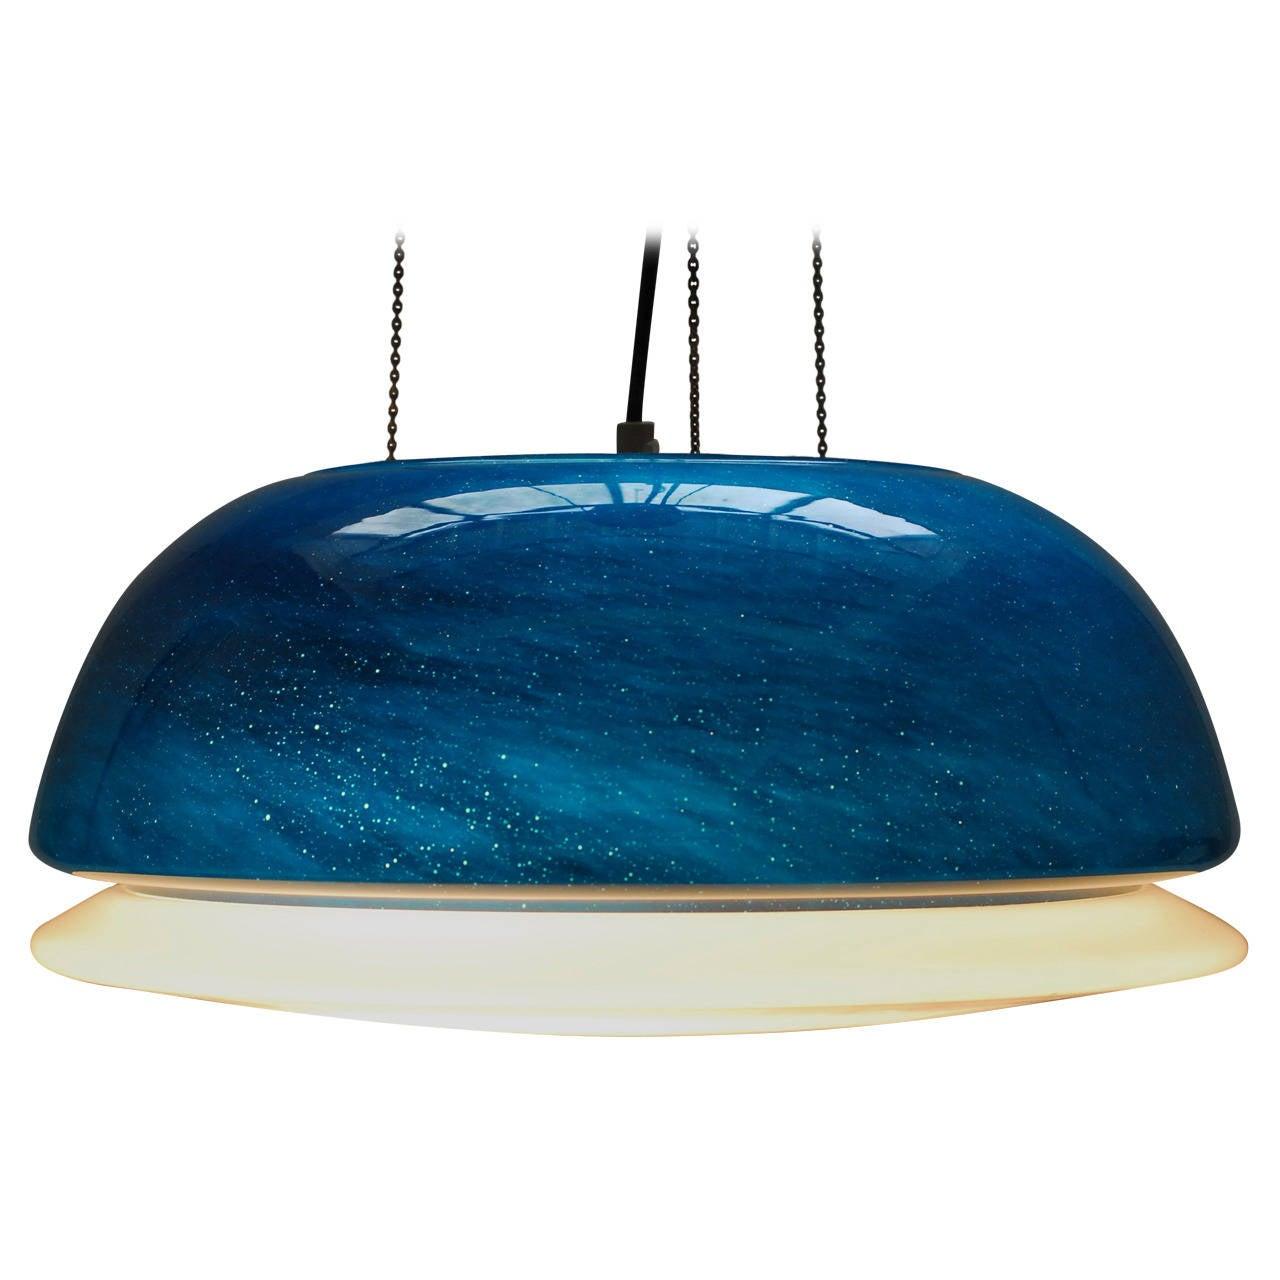 1960s Italian Murano Glass Ceiling Lamp At 1stdibs